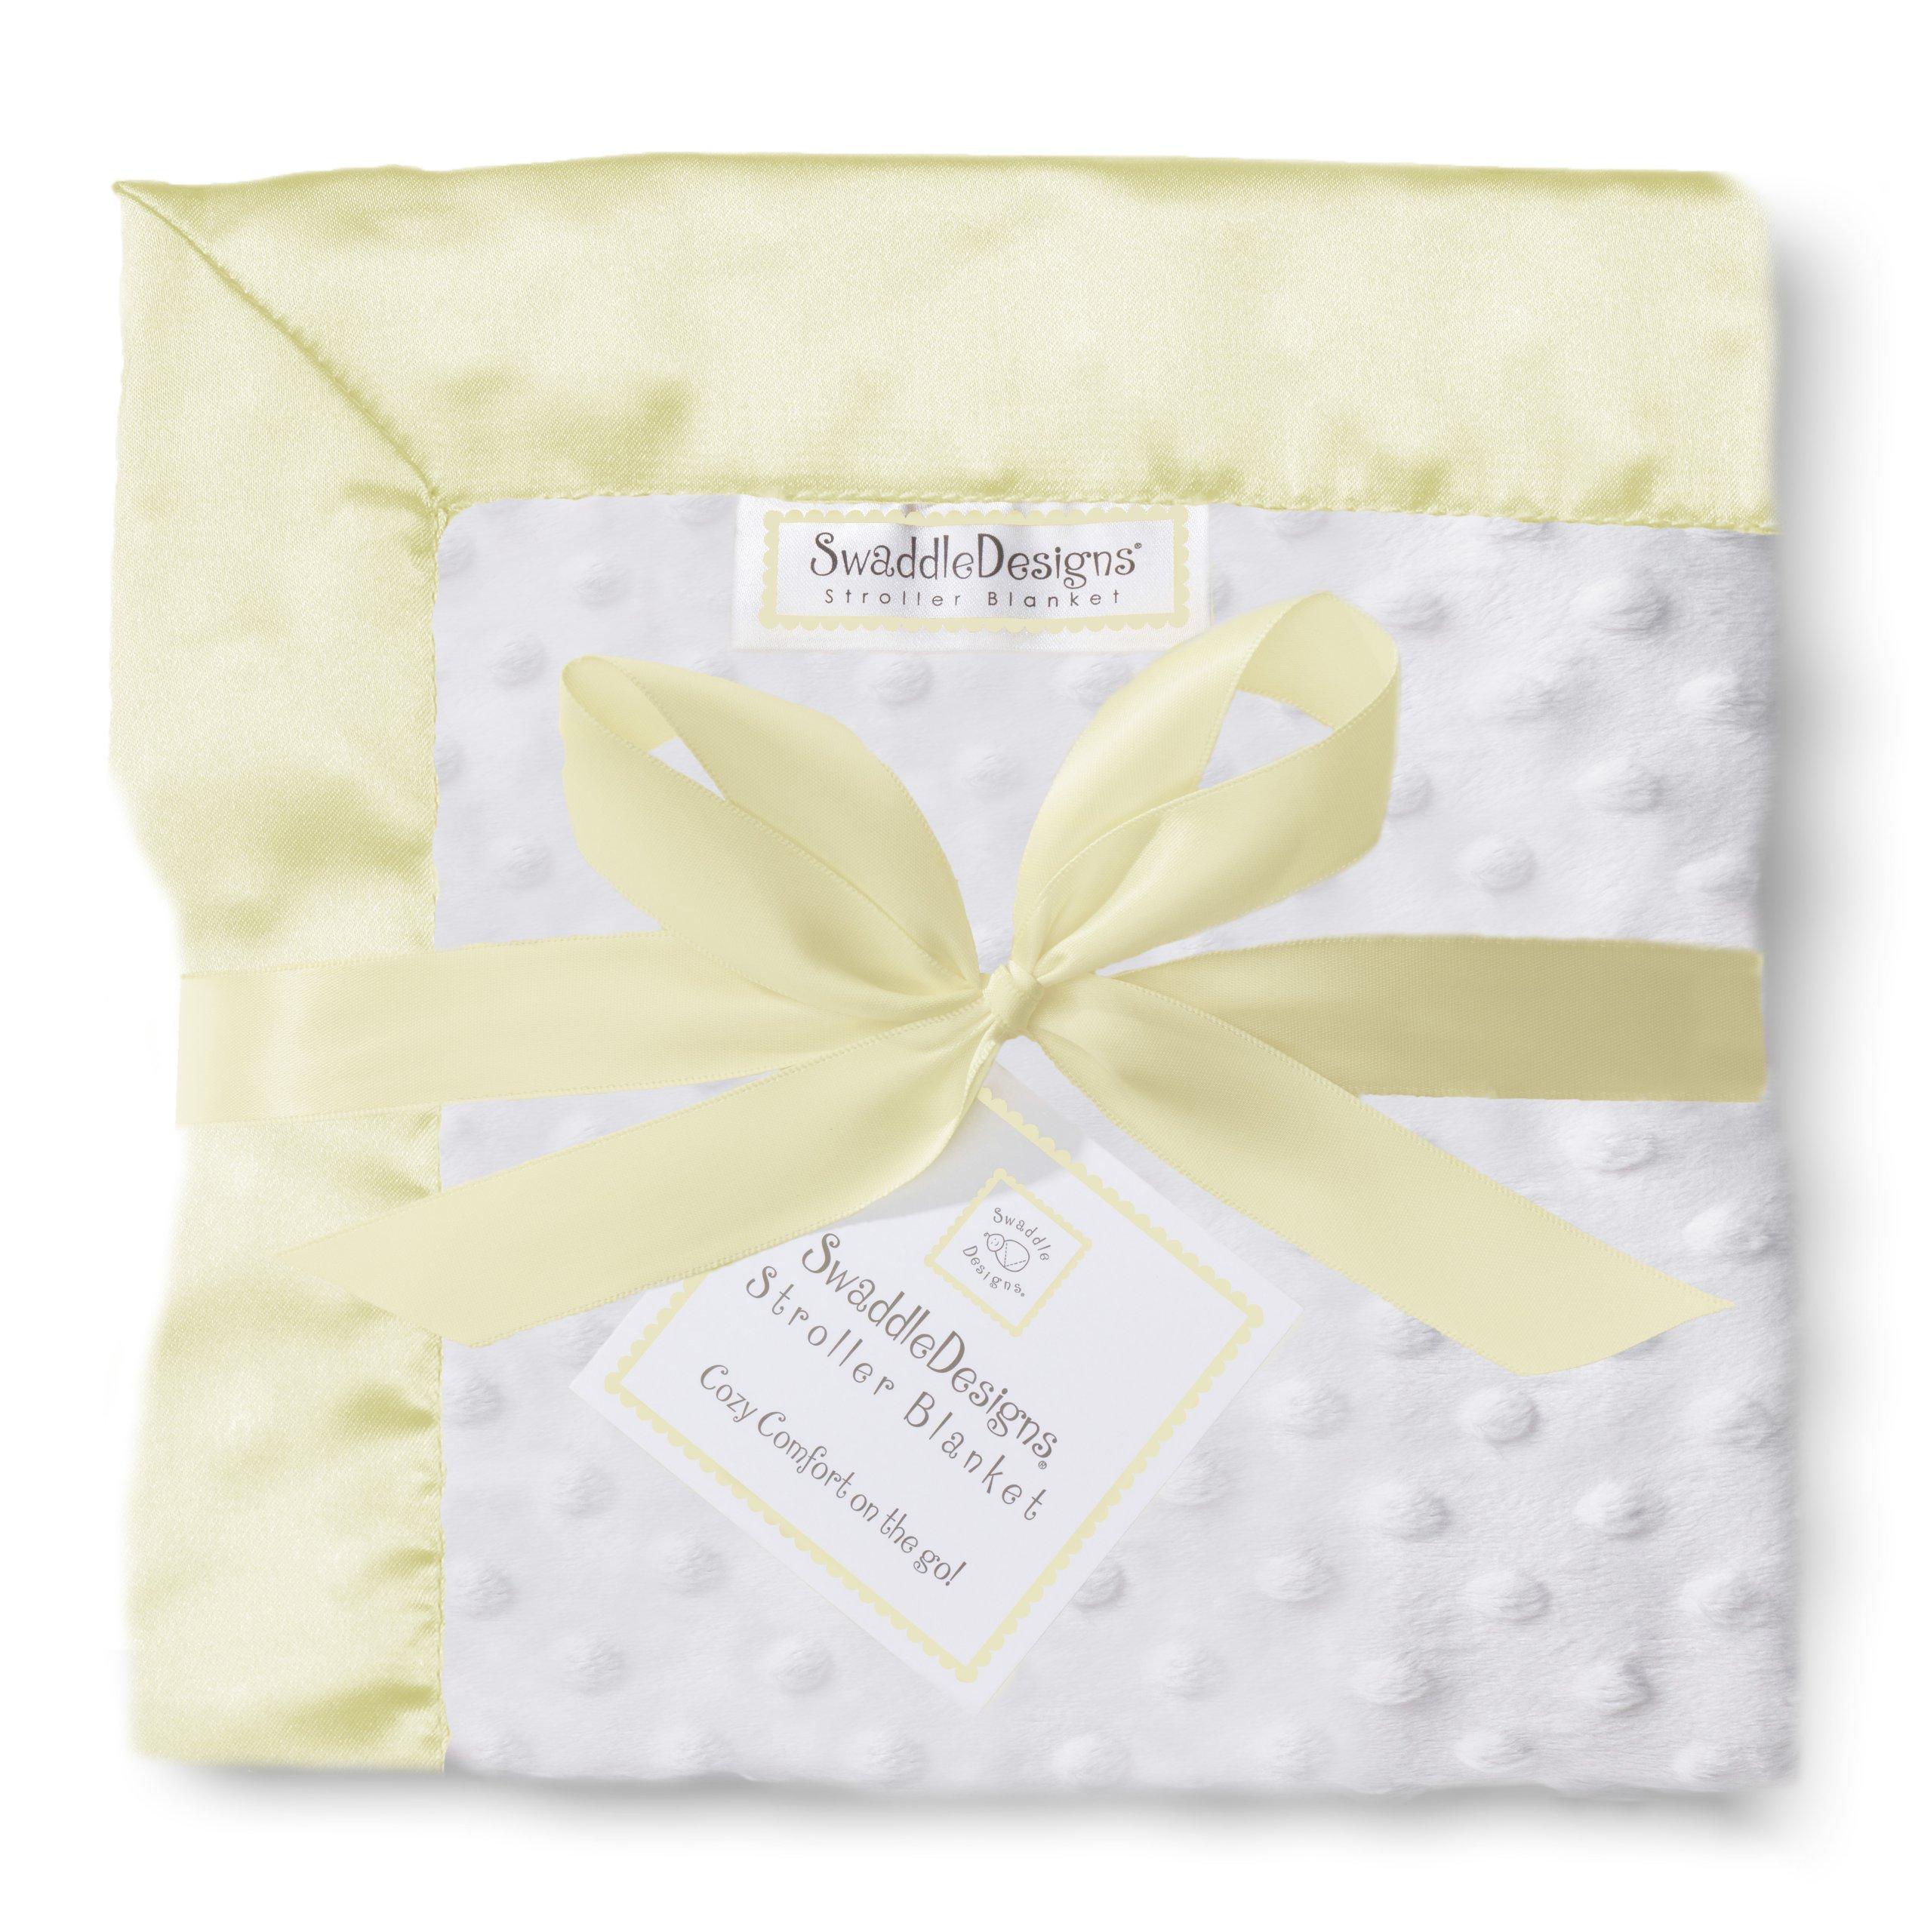 SwaddleDesigns Stroller Blanket, Cozy Microfleece, Plush Dots with Pastel Yellow Satin Trim